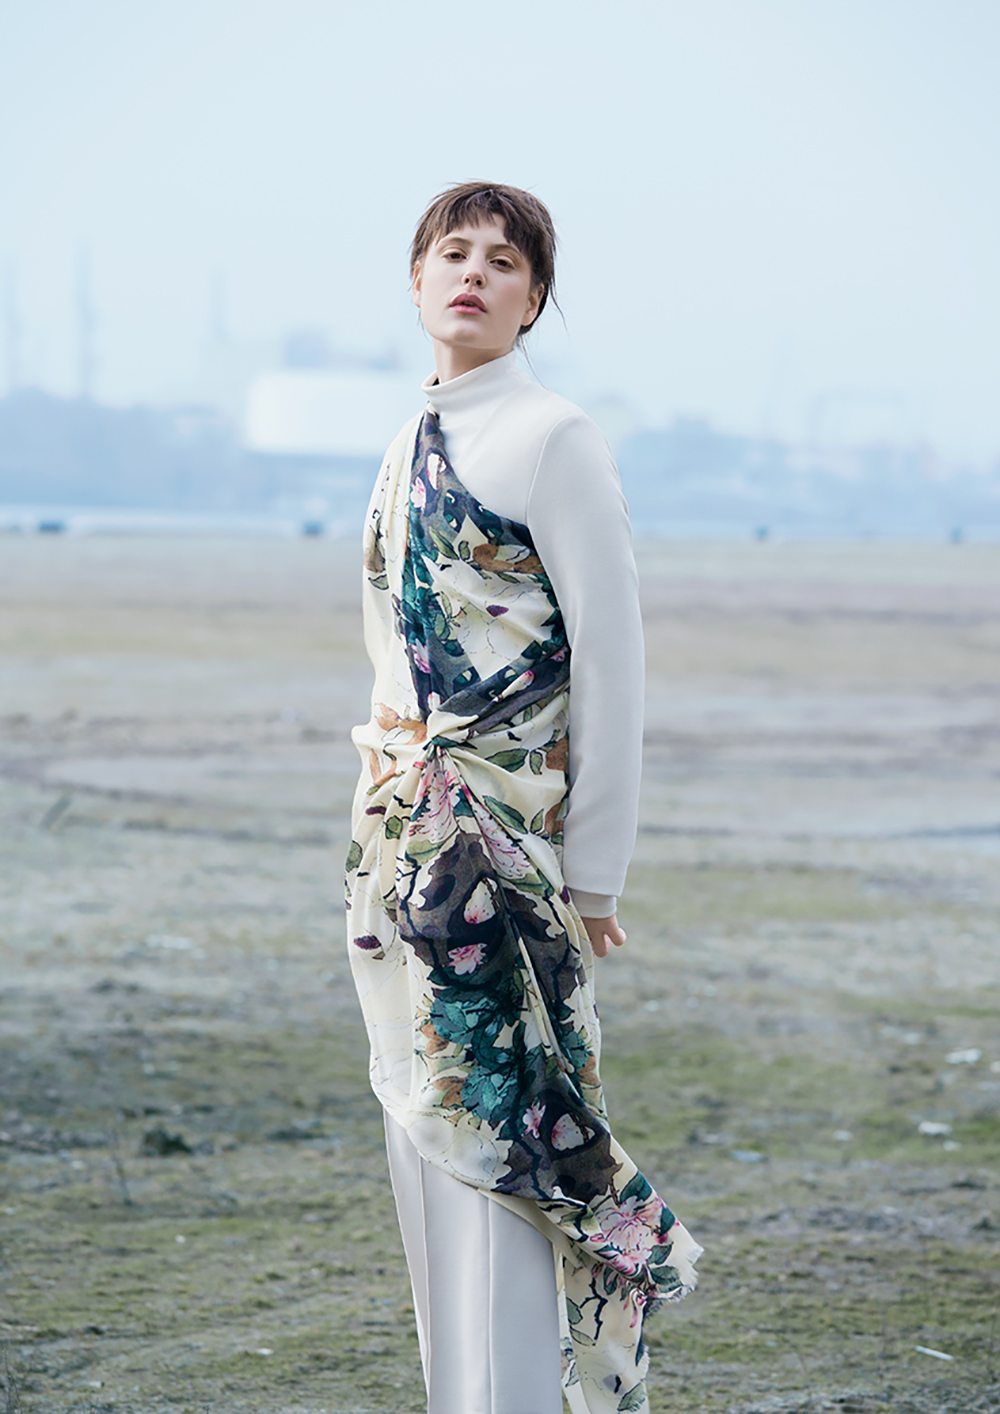 MA Fashion Photography Alumni Kári Sverriss graduated from LCF in 2014.